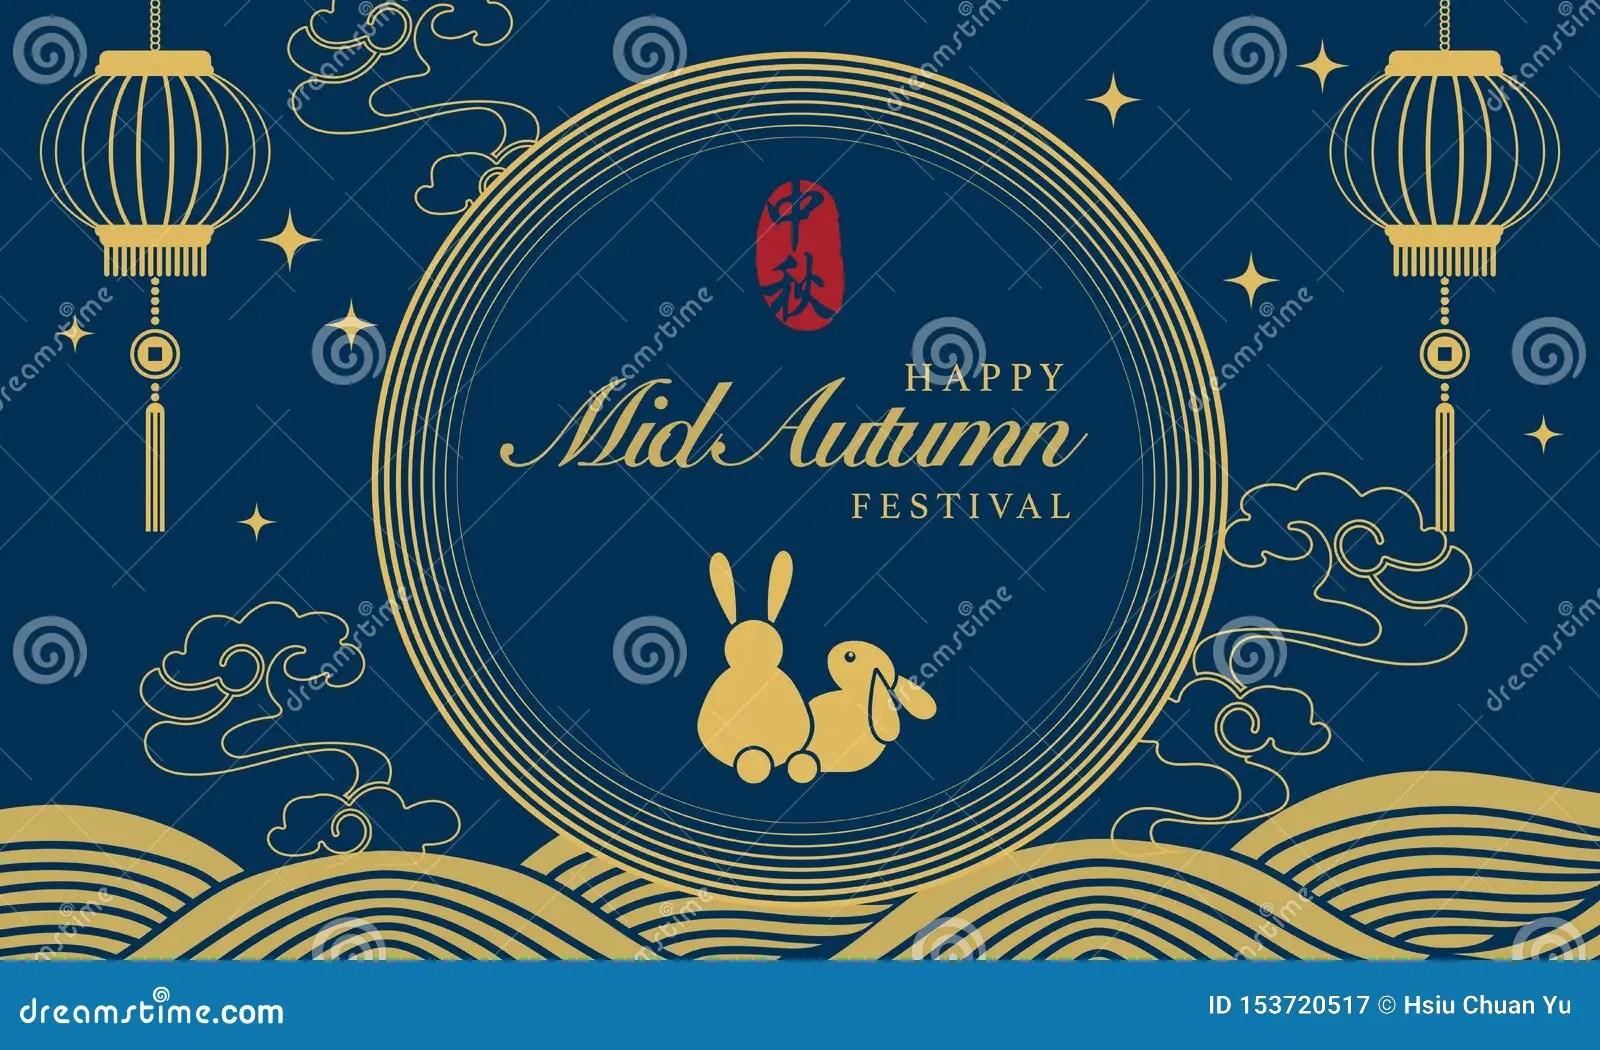 Retro Style Chinese Mid Autumn Festival Full Moon Night